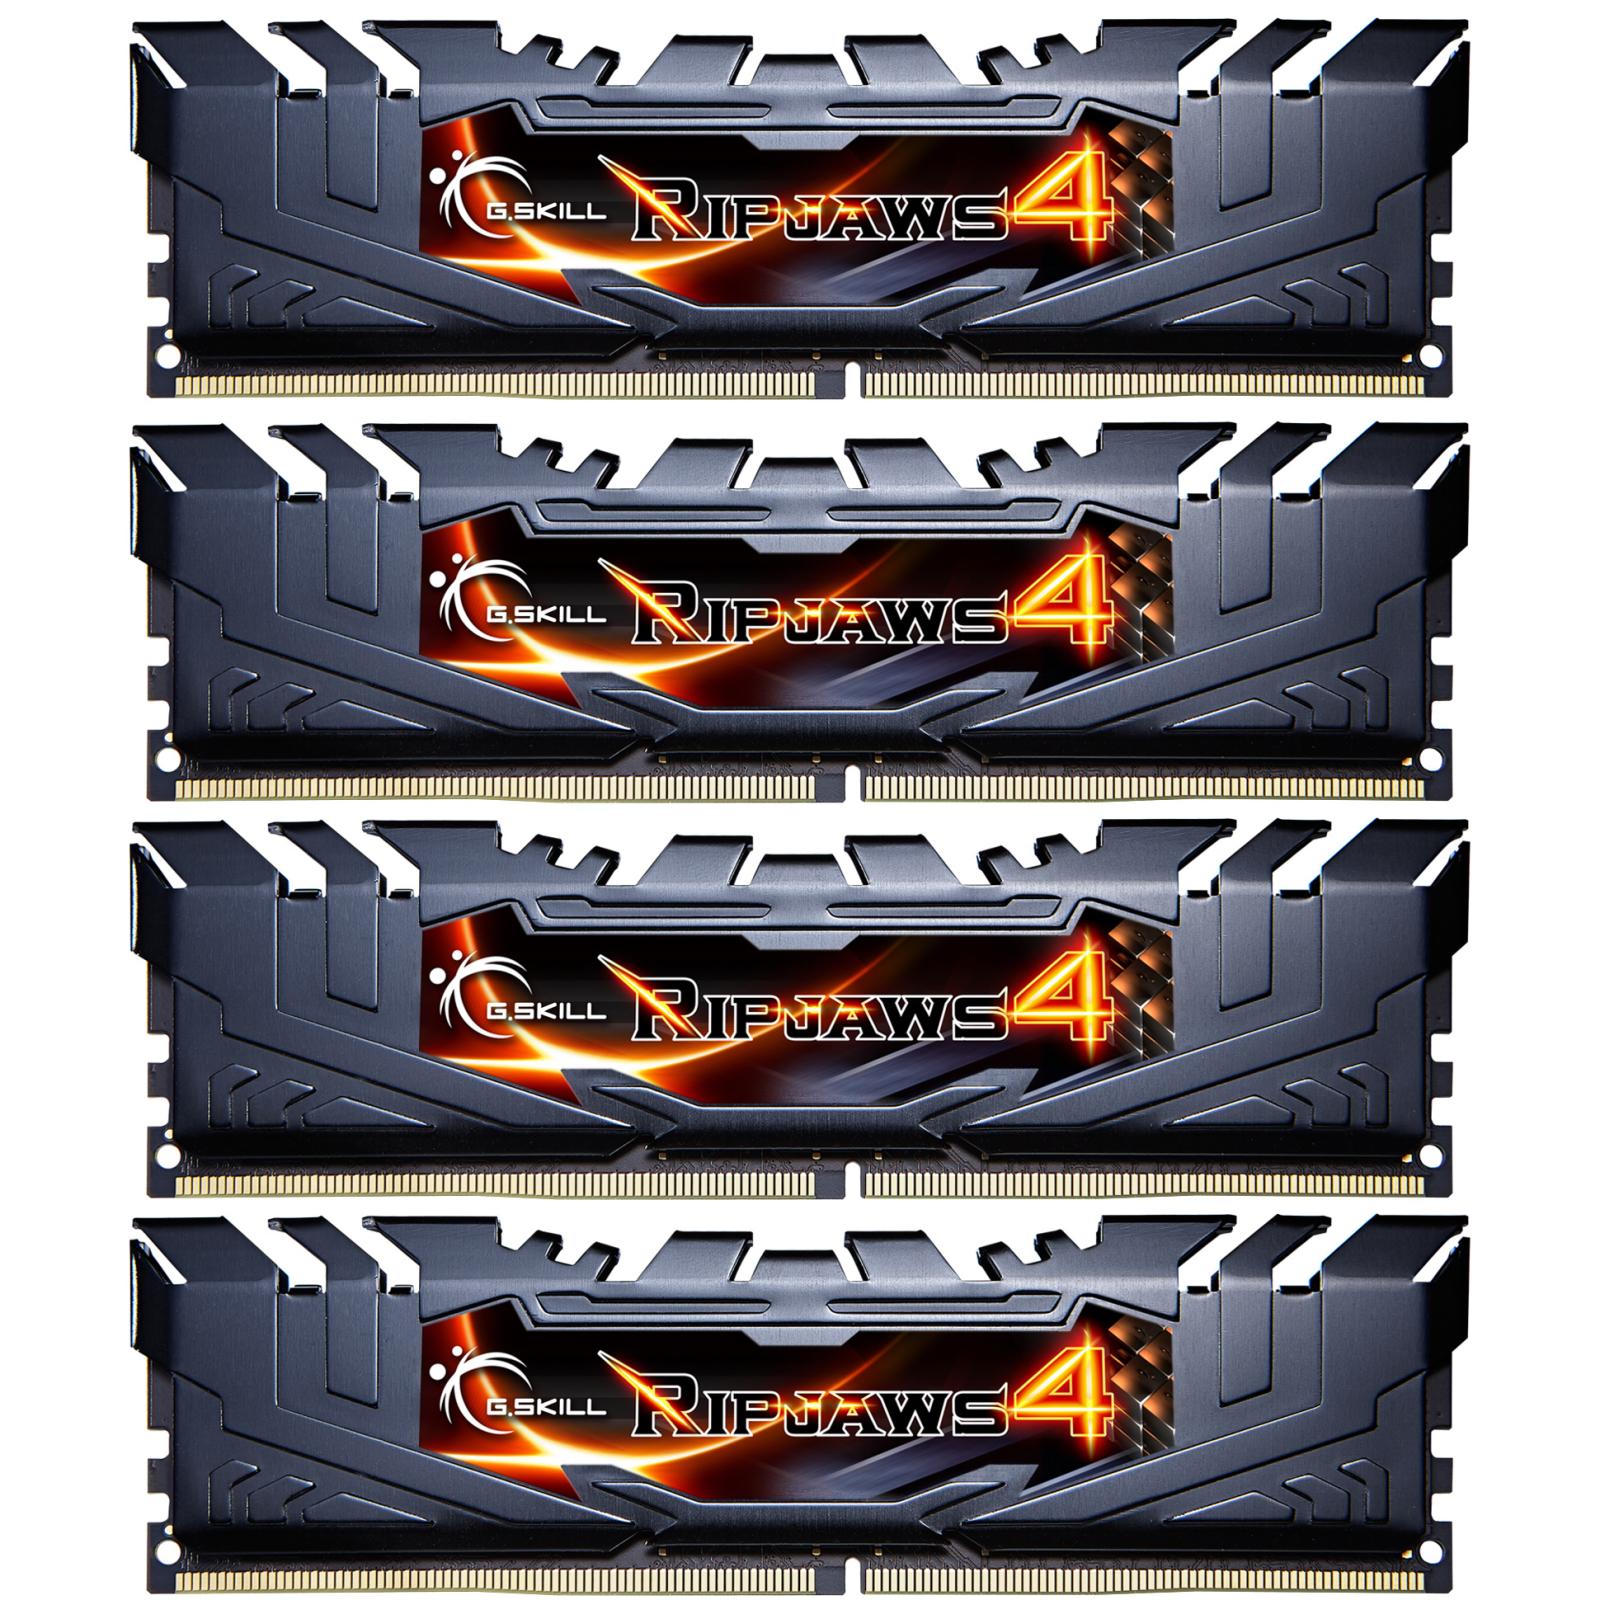 Модуль памяти для компьютера DDR4 16GB (4x4GB) 2400 MHz Ripjaws G.Skill (F4-2400C14Q-16GRK)